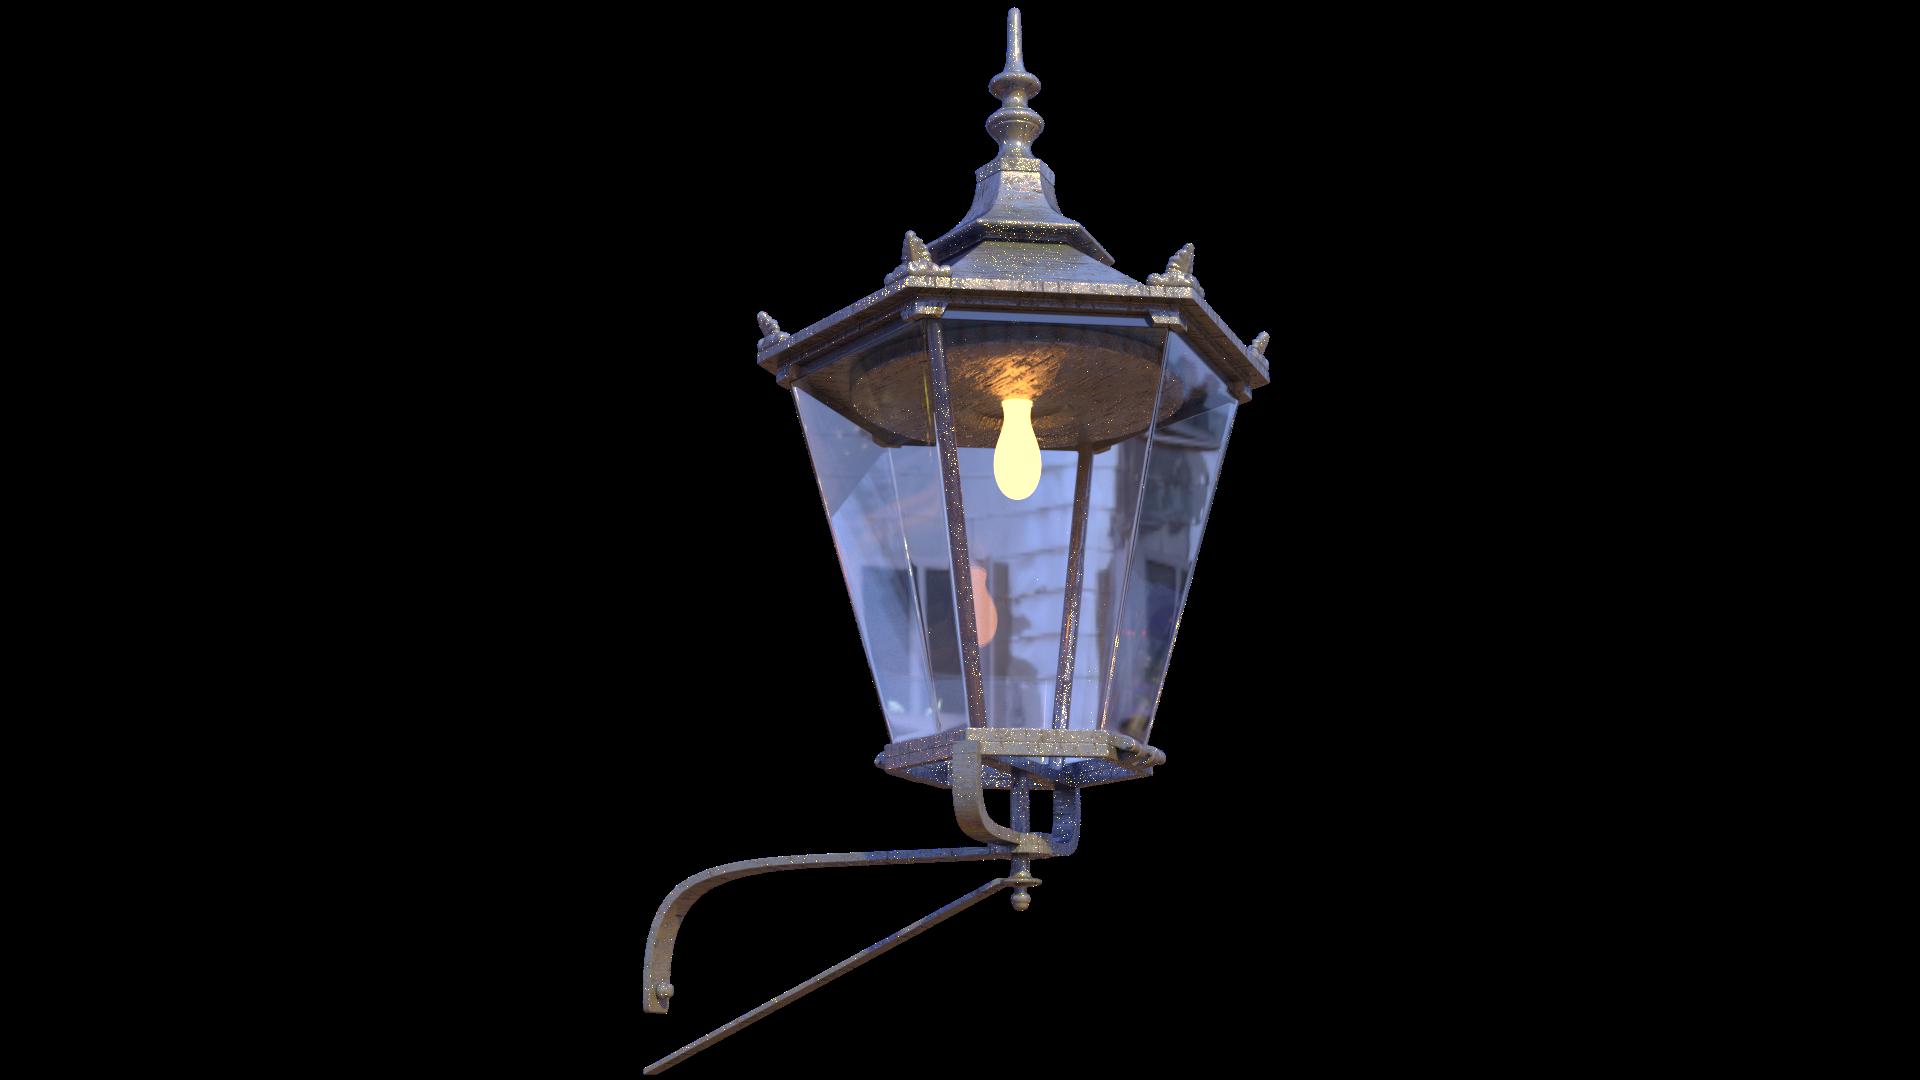 Free 3D Wall Lamp CC0 3DS - Free 3D Models Under Public Domain